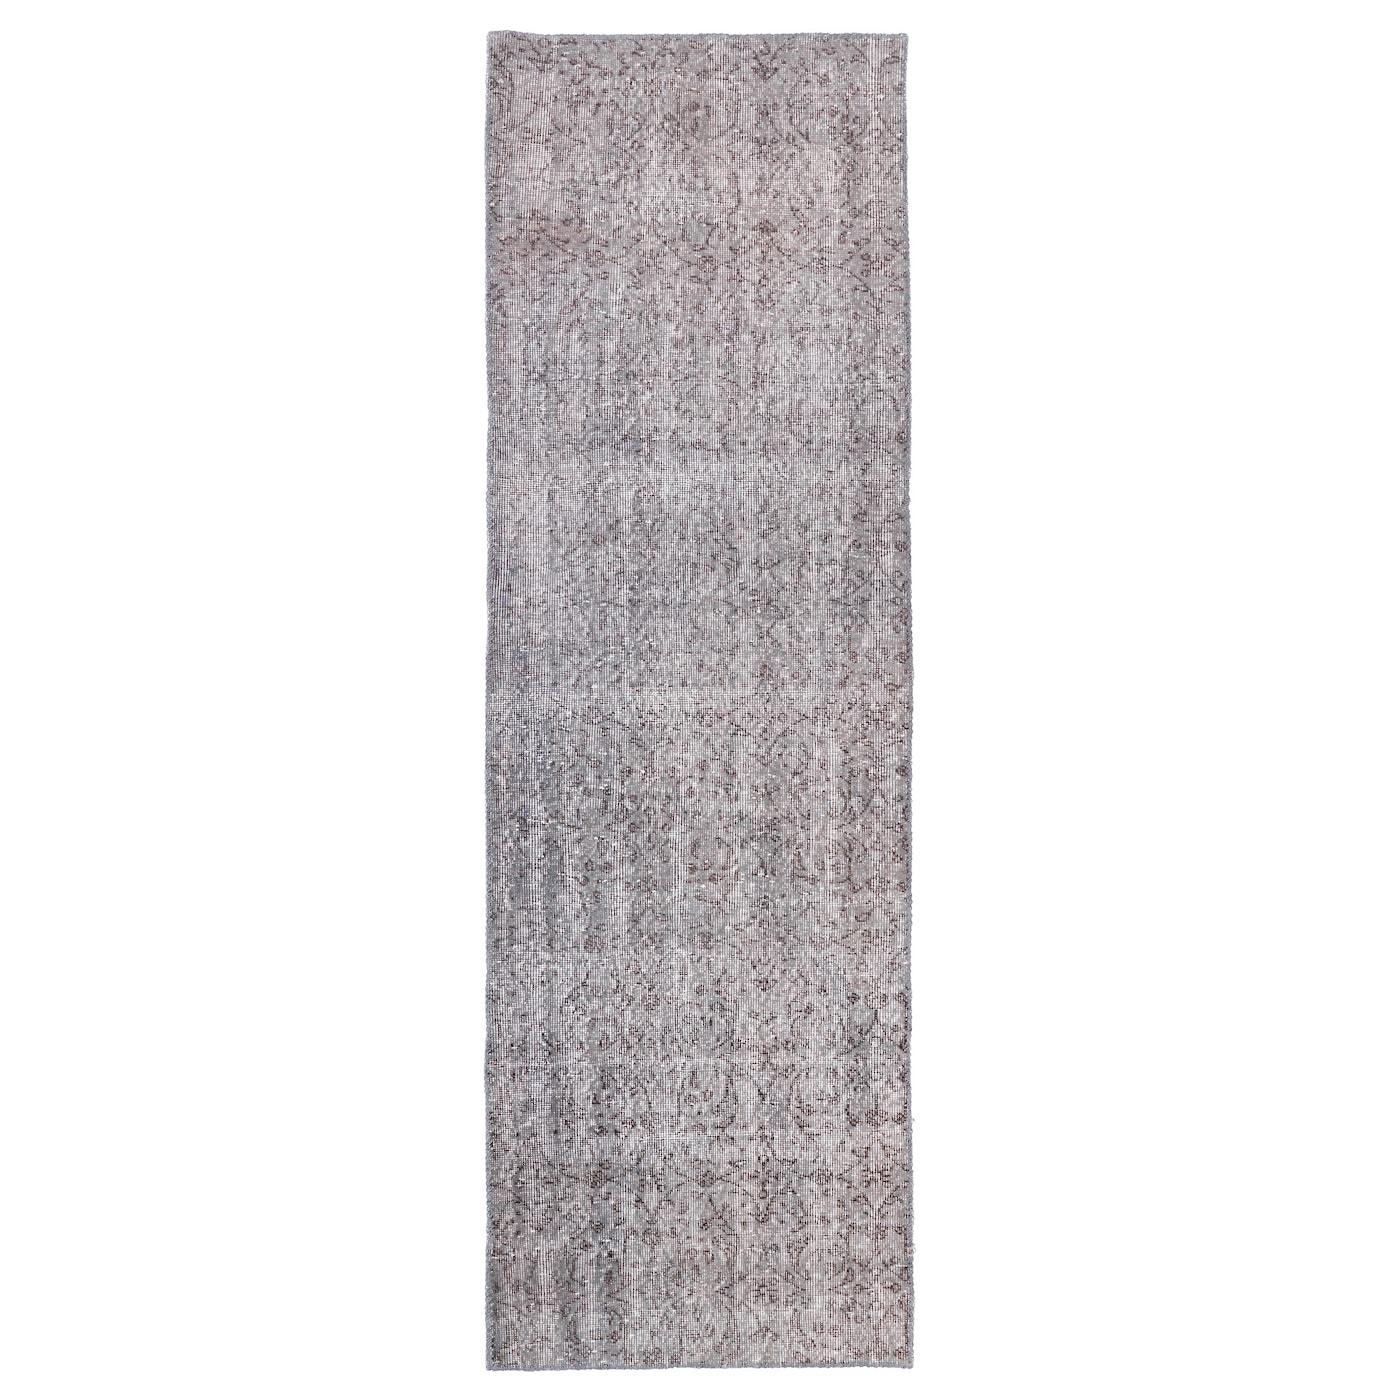 Silkeborg rug low pile grey 80x250 cm ikea for Grey rug ikea